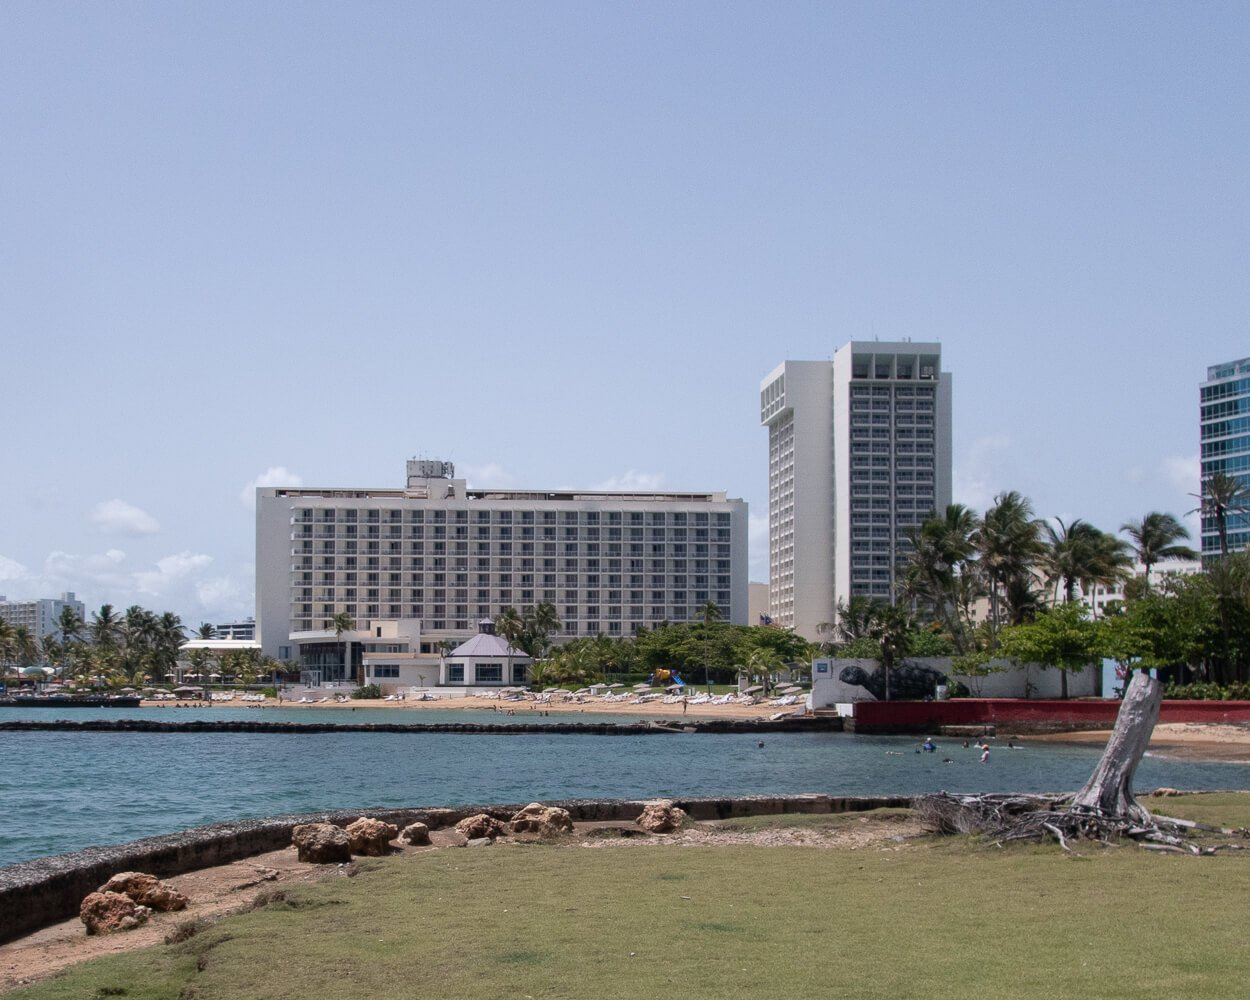 Caribe Hilton from Escambron Marine Park